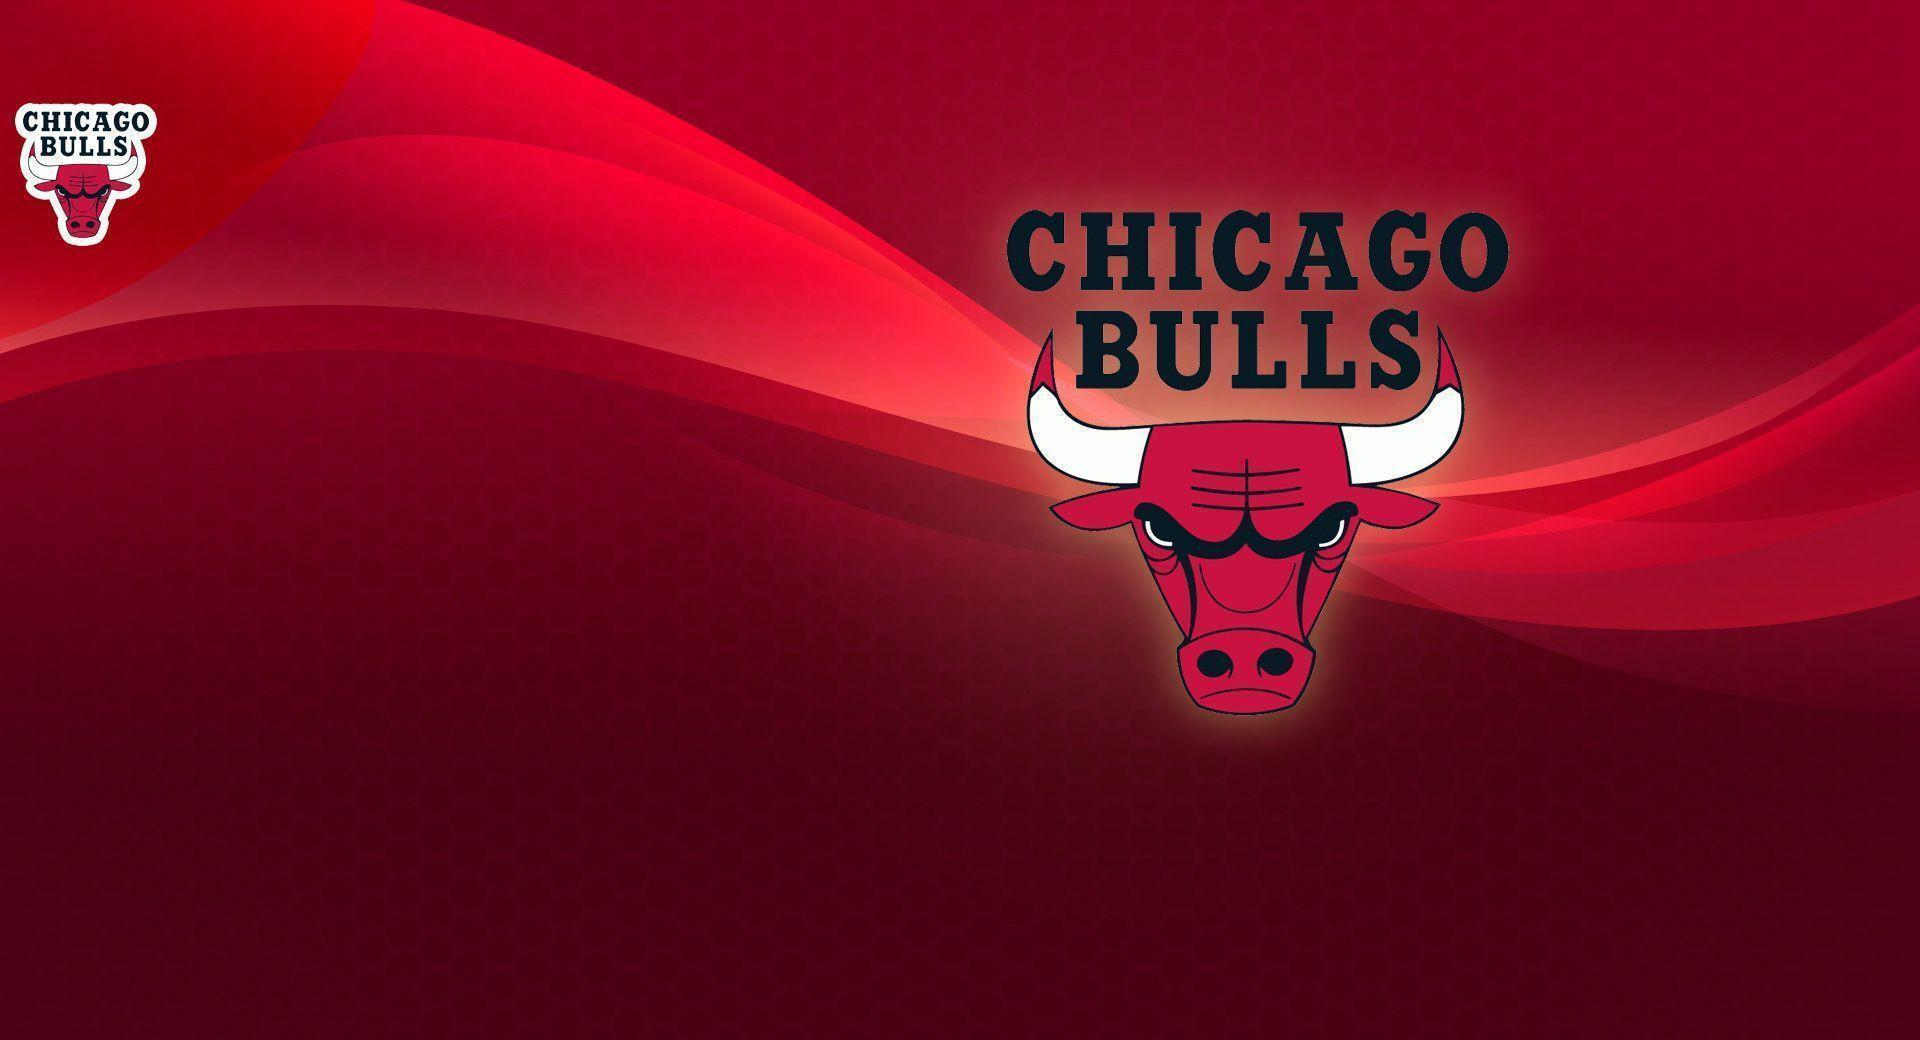 Chicago Bulls Wallpapers HD 2015